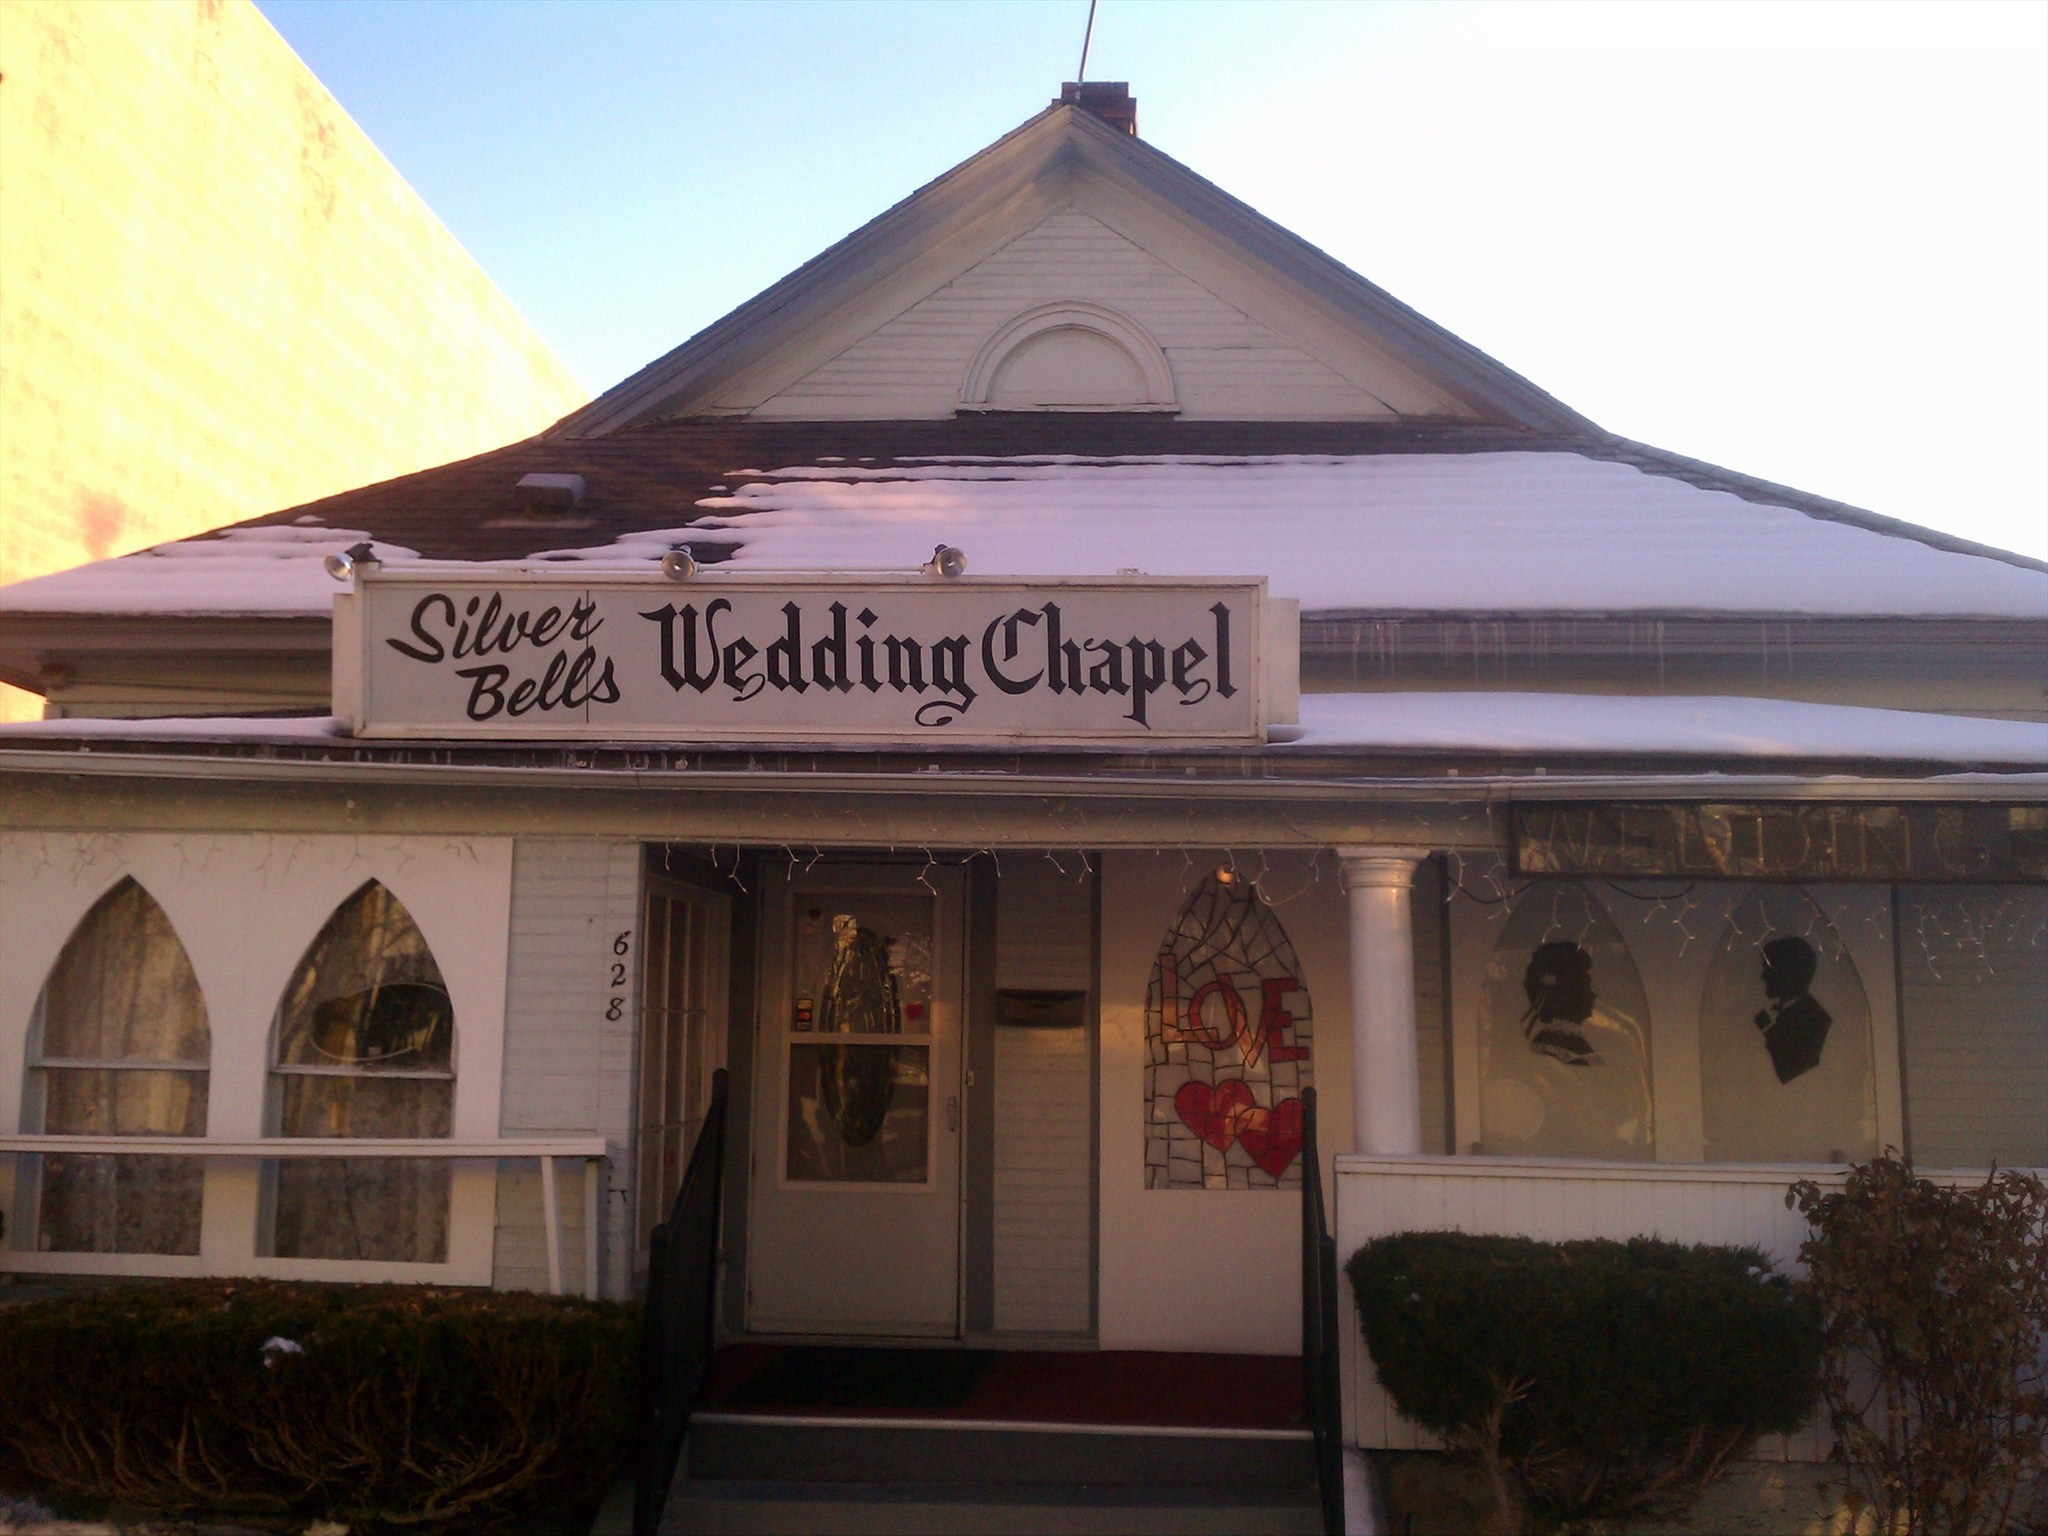 Silver Bells Wedding Chapel Reno Nv Image